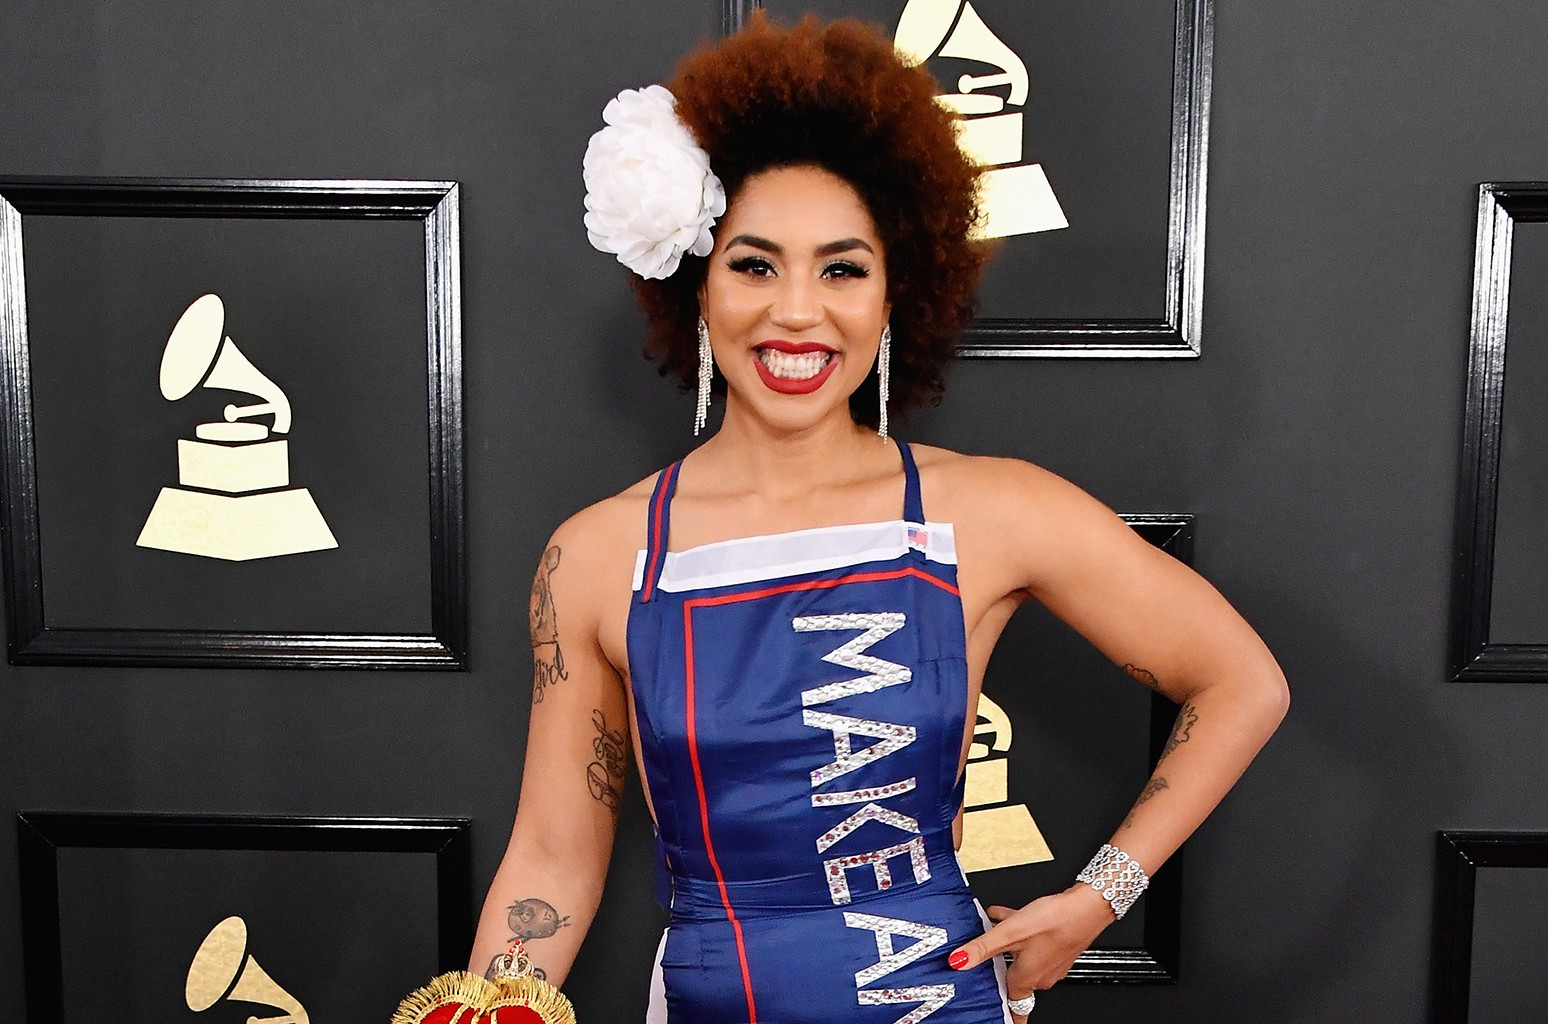 Pro-Trump Singer Joy Villa Talks 'Overwhelming Support' Thanks to Grammys Dress